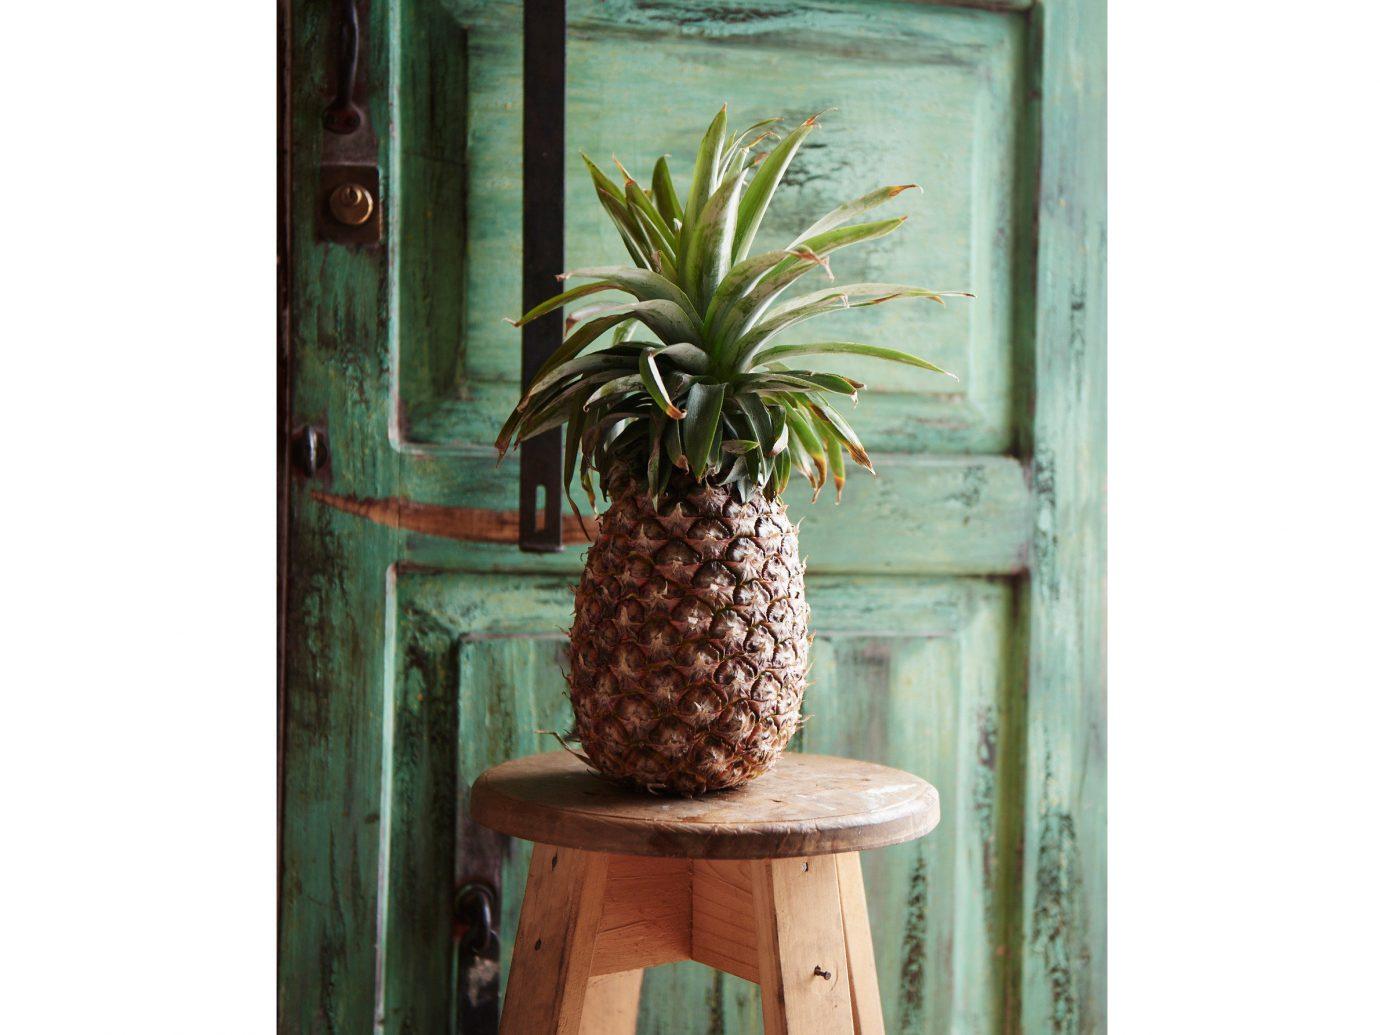 Trip Ideas plant window produce land plant arecales food pineapple fruit flowering plant carving bromeliaceae